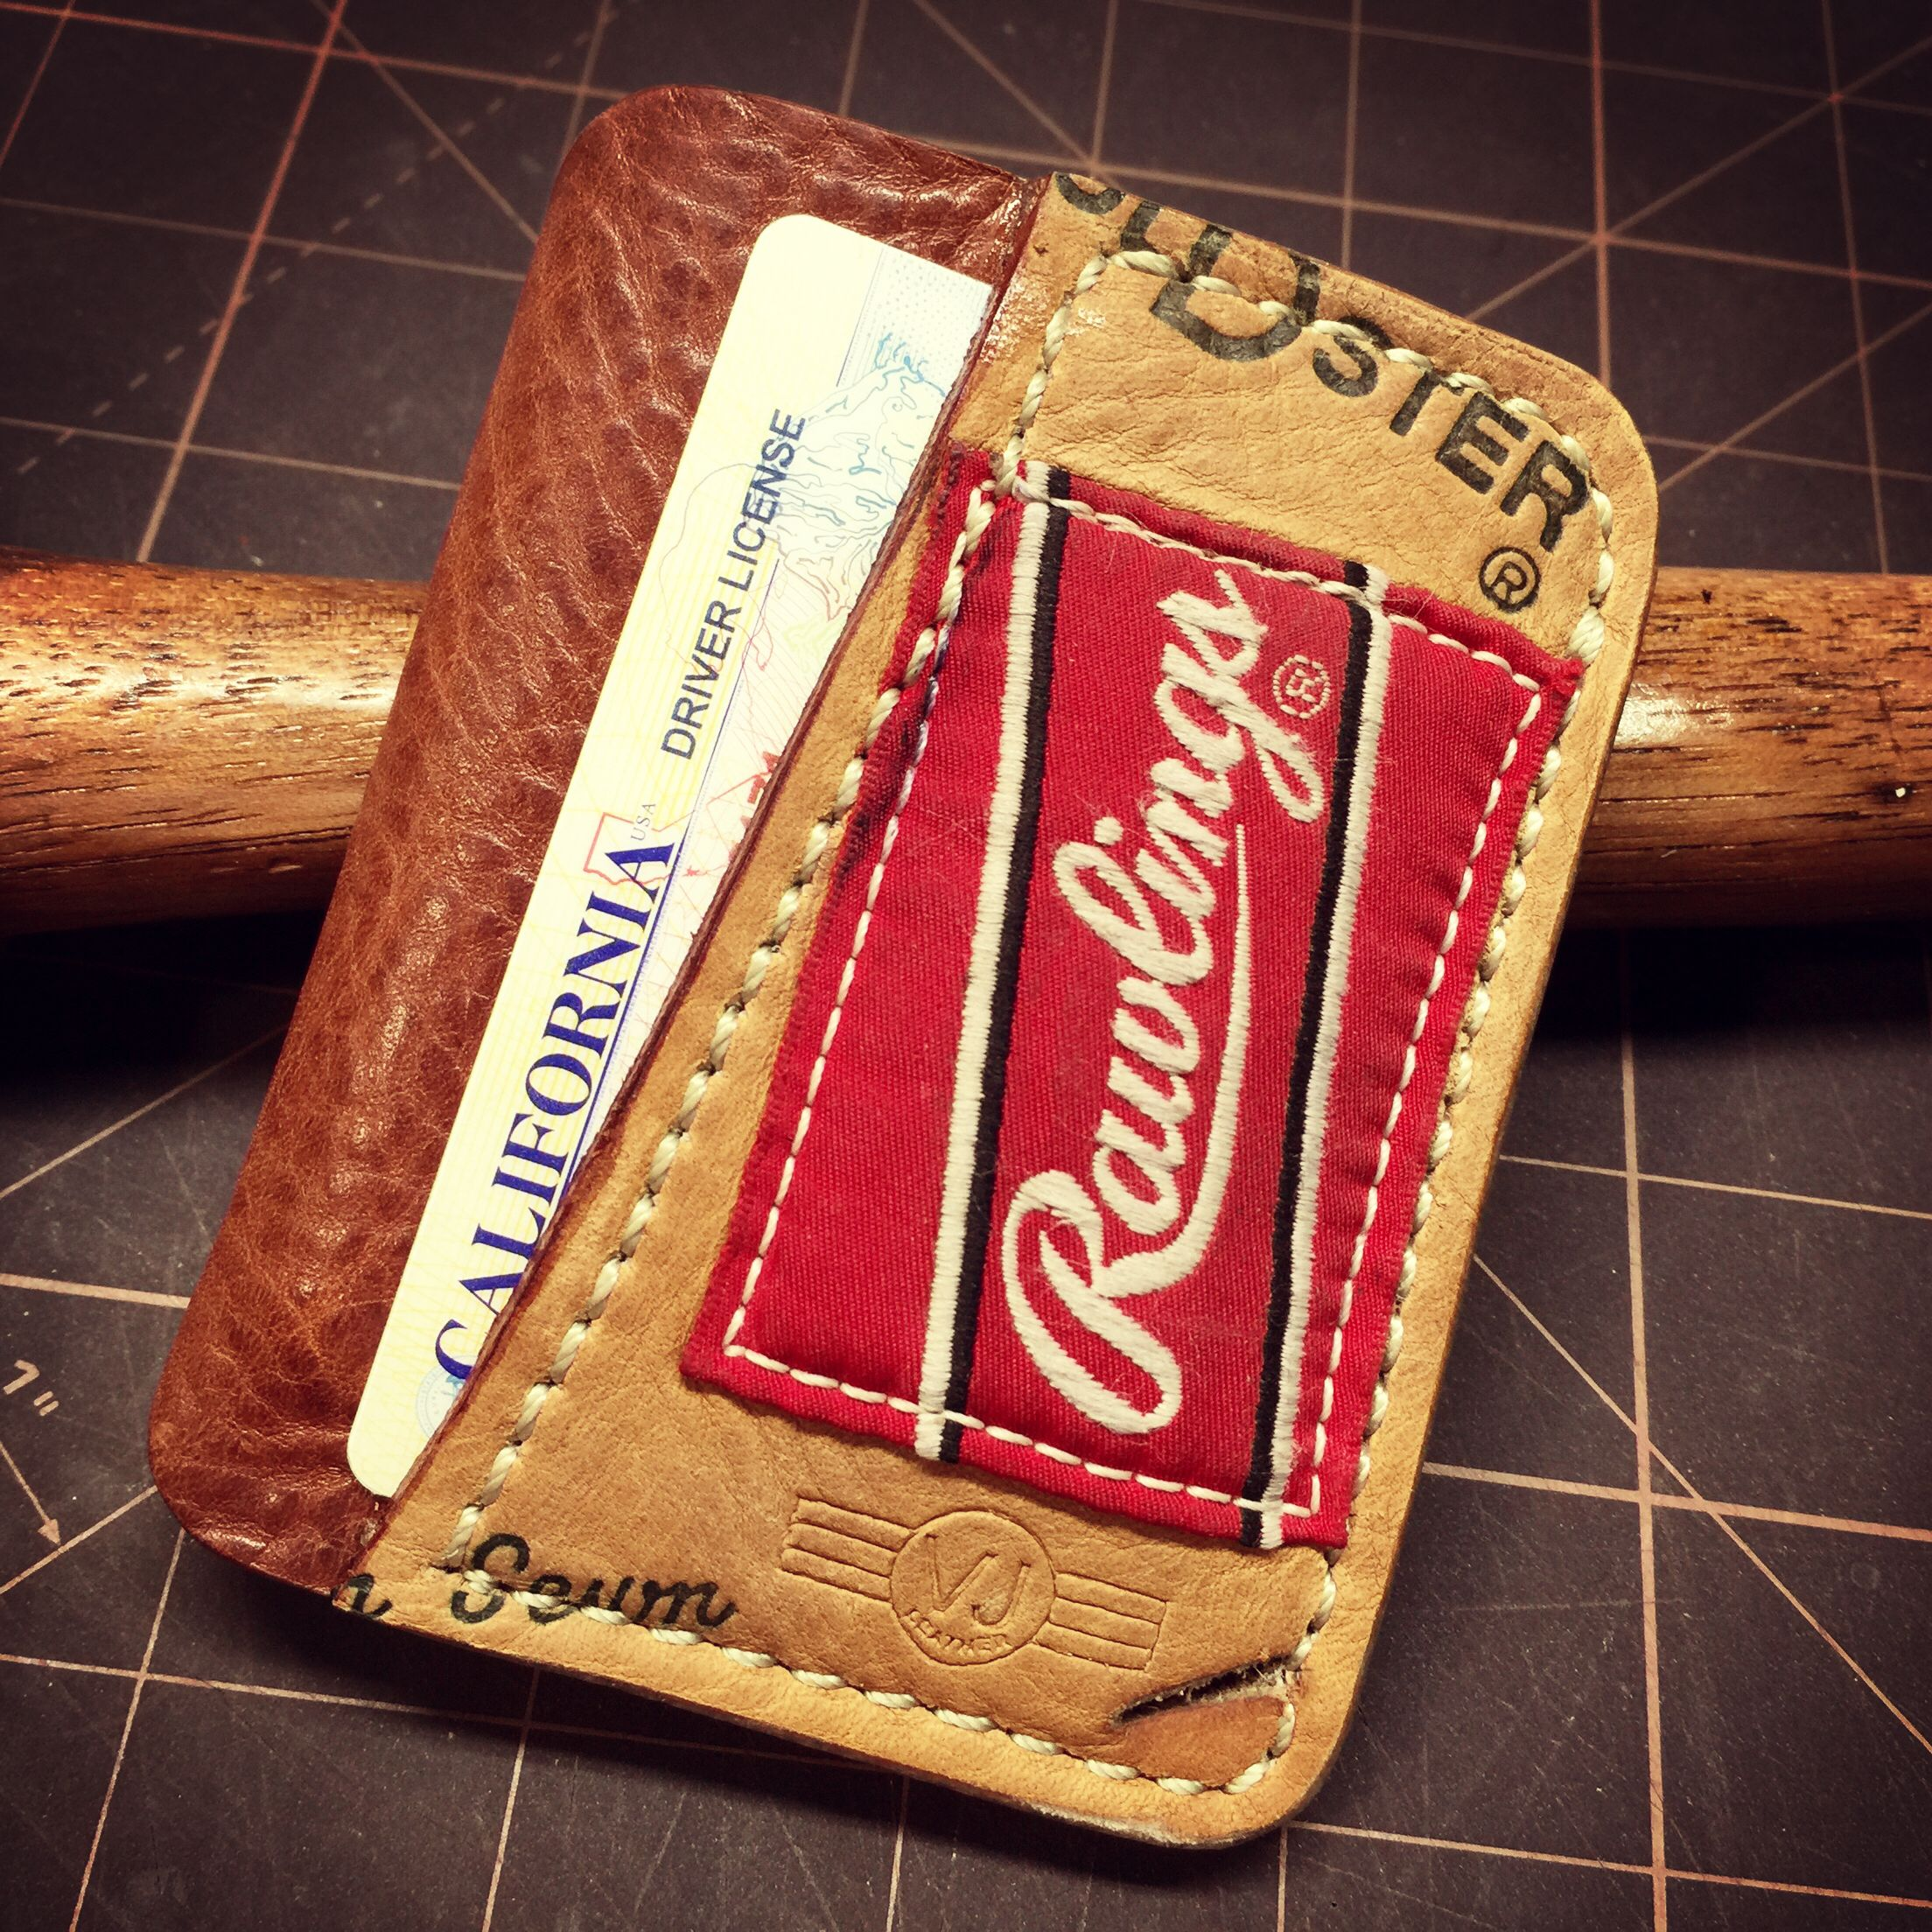 Recycled baseball glove wallet - Baseball Glove Wallet 2016 02 Ready To Go Www Beefskin Com